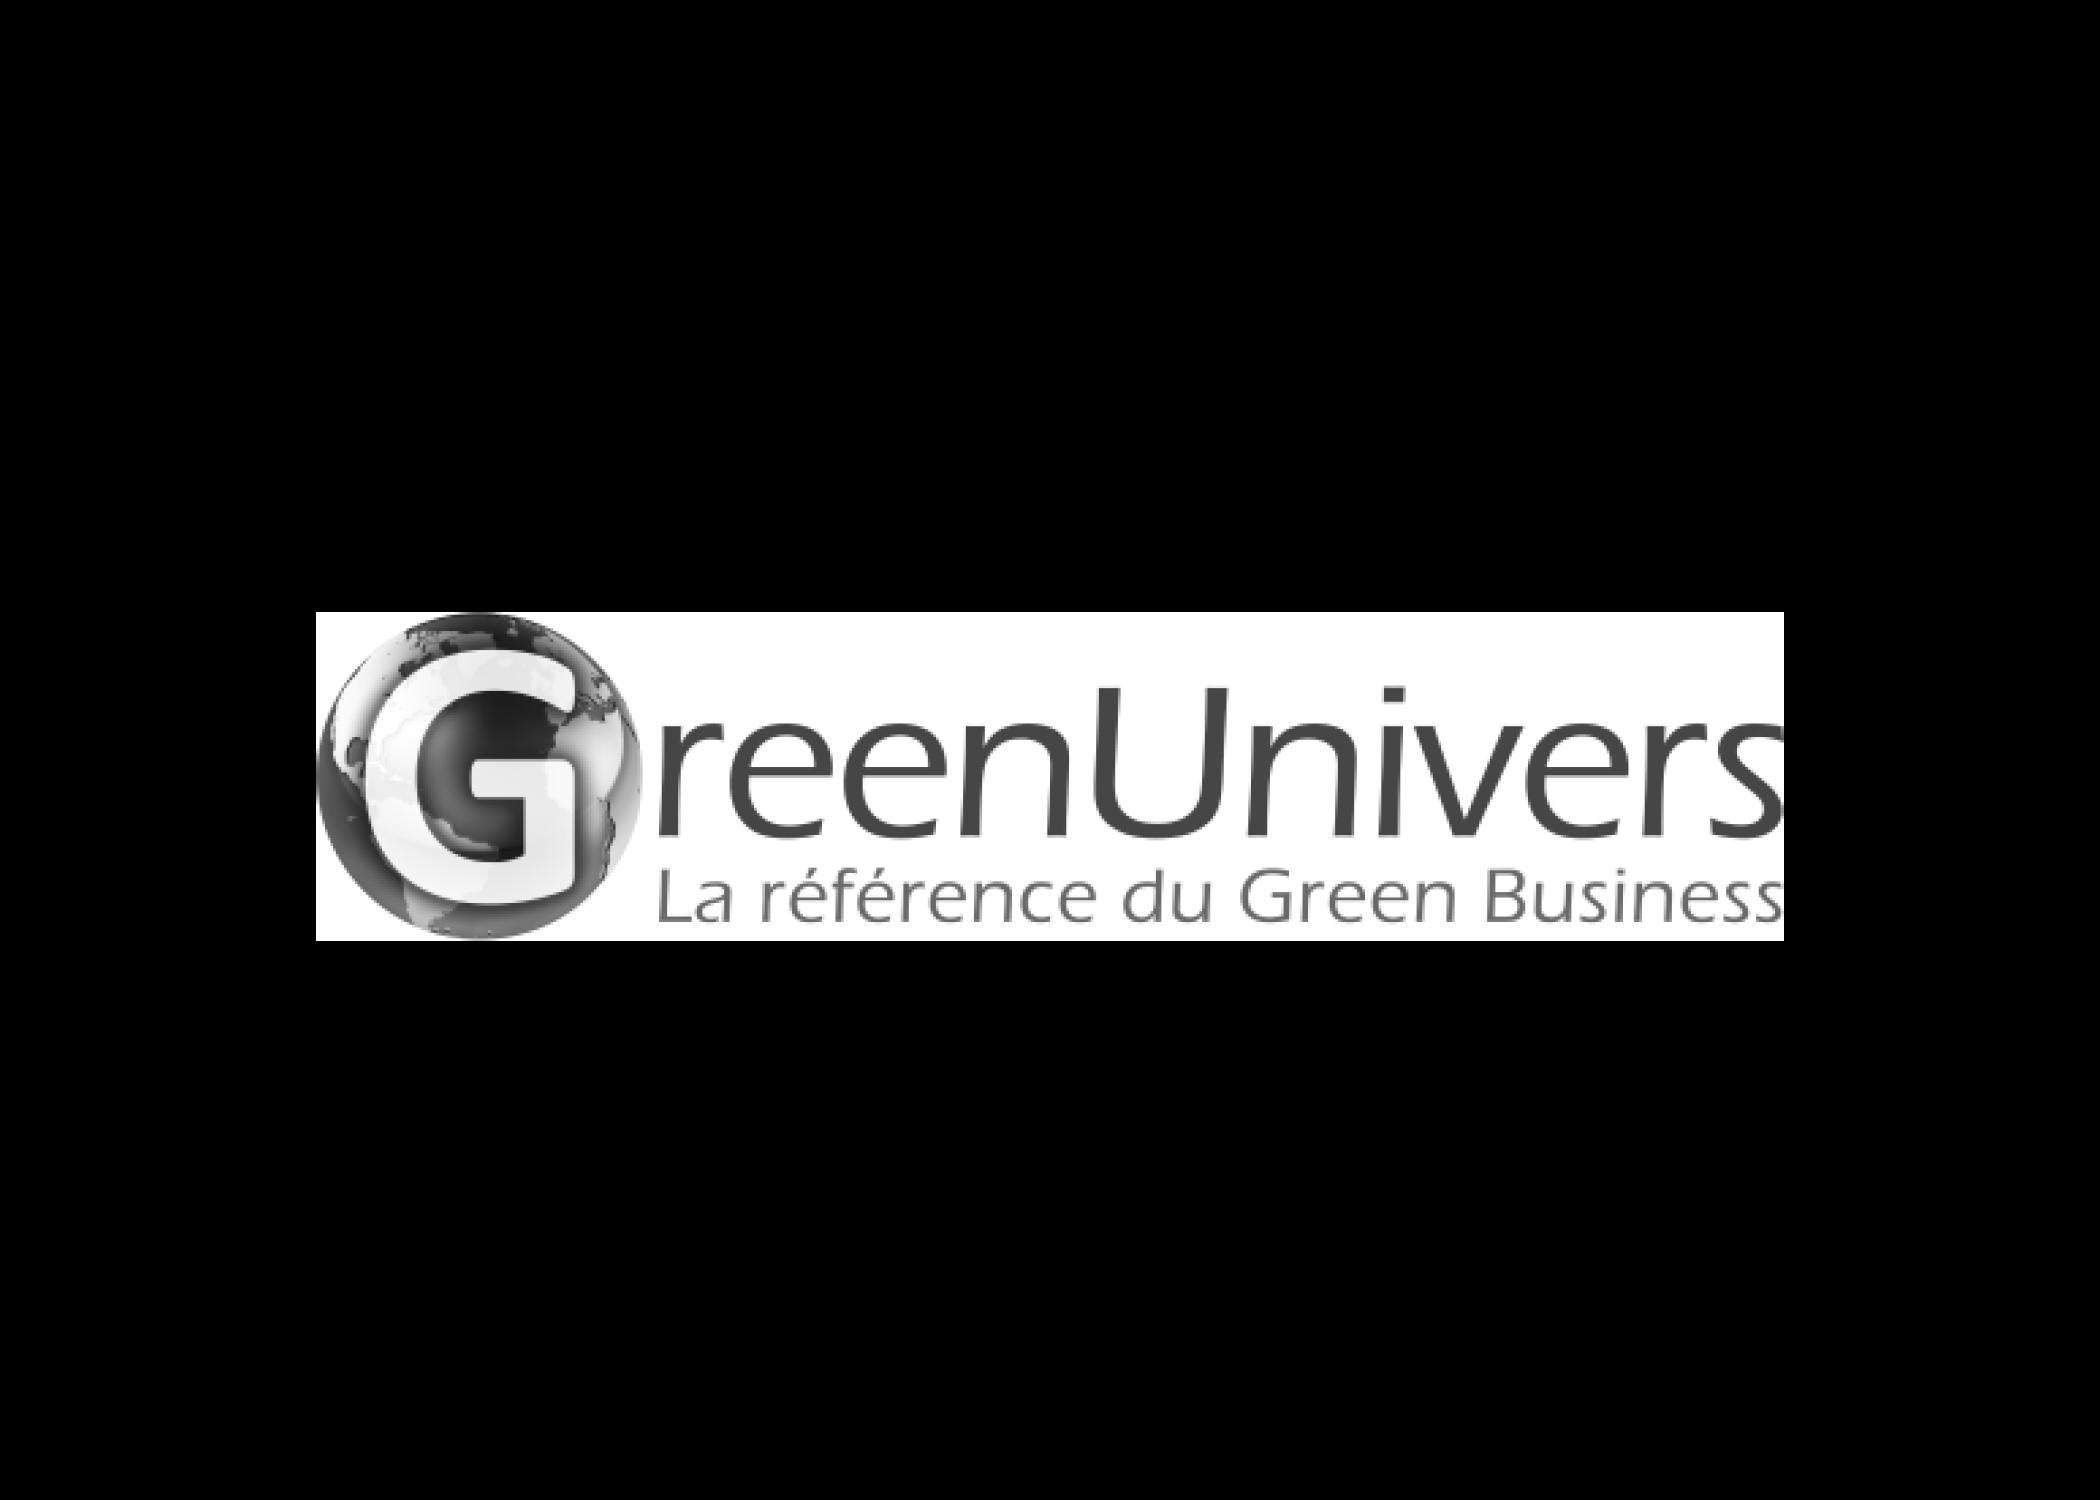 GreenUnivers